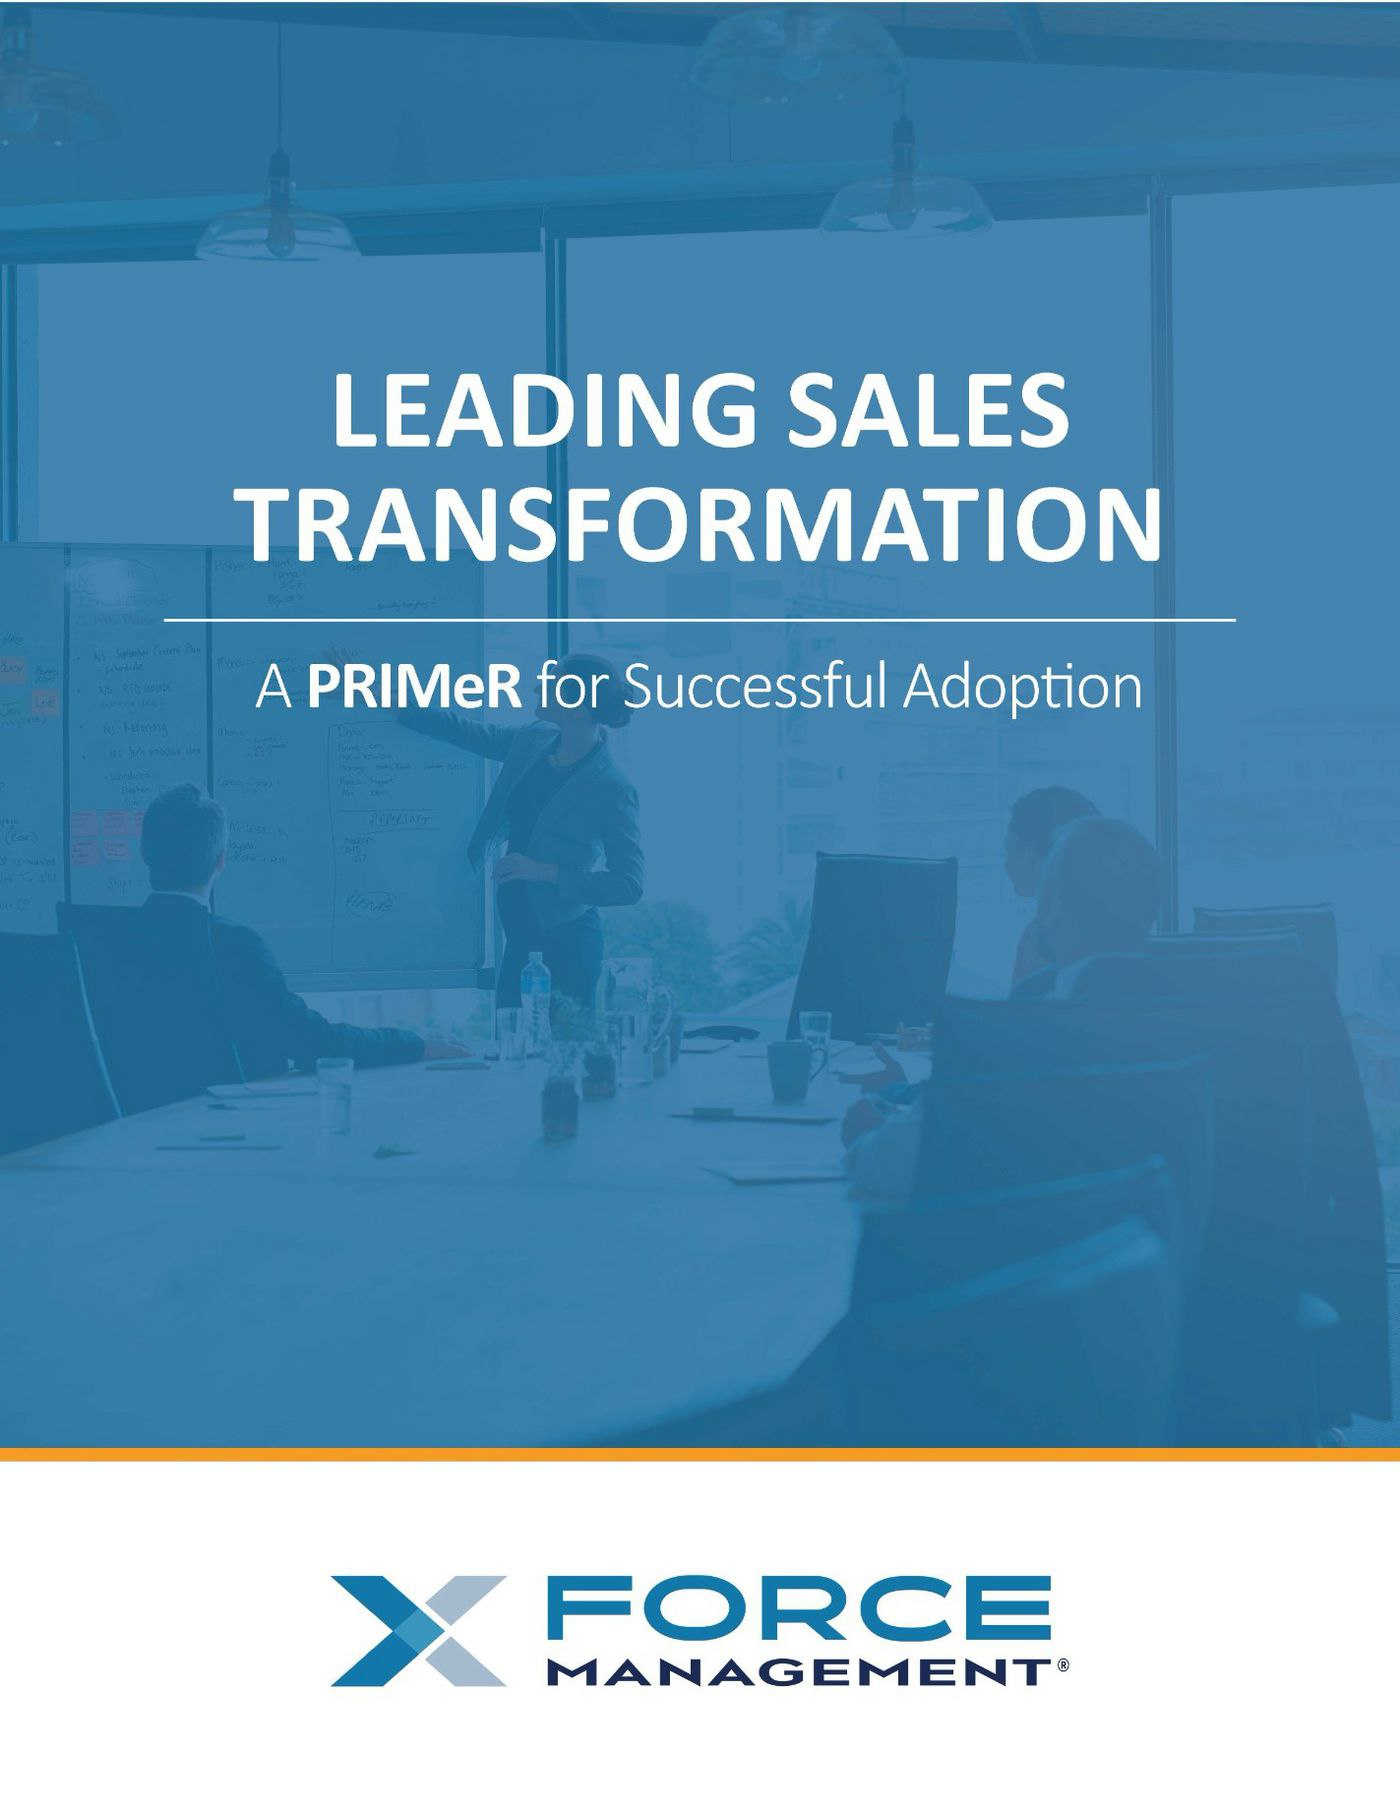 FM_leading_sales_transformation IMAGE.jpg